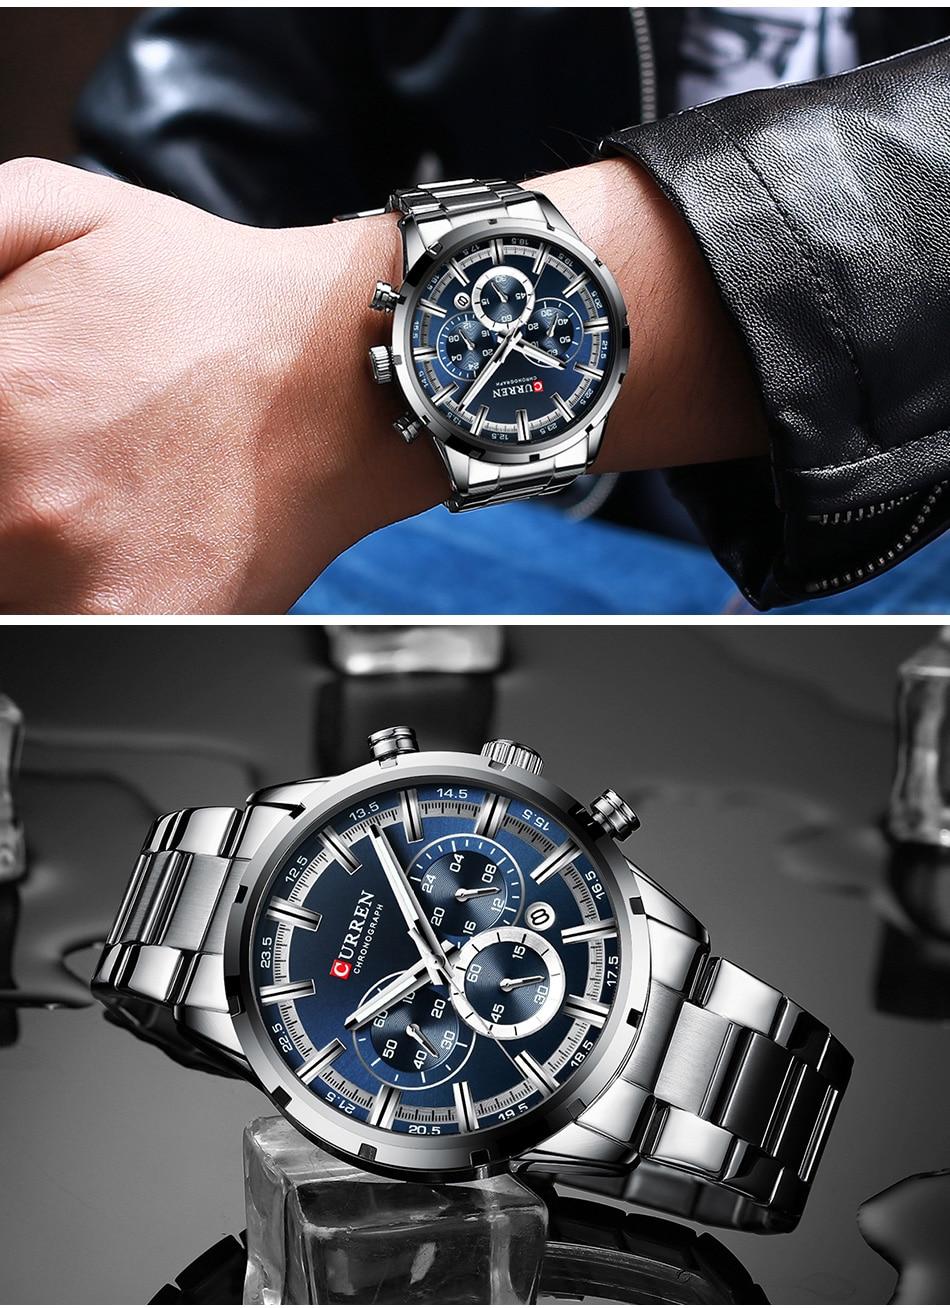 H5209f2721a194aaab8a017282b45b786B CURREN Men Watch Top Brand Luxury Sports Quartz Mens Watches Full Steel Waterproof Chronograph Wristwatch Men Relogio Masculino